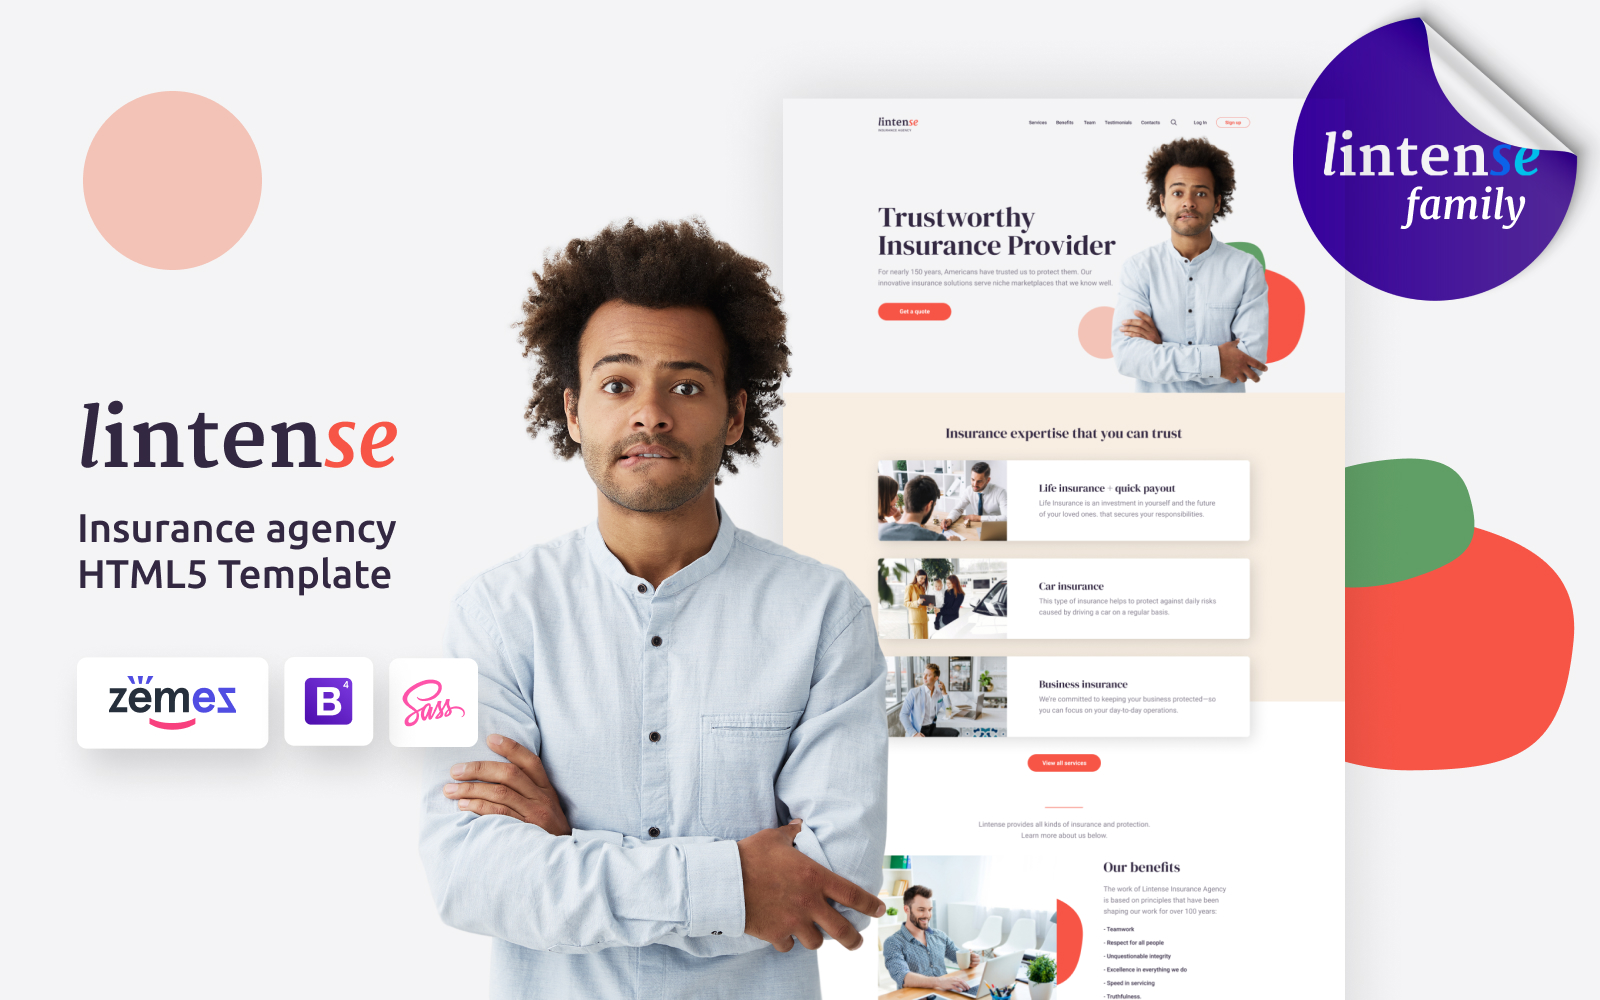 Lintense Insurance Agency - Creative HTML Landing Page Template